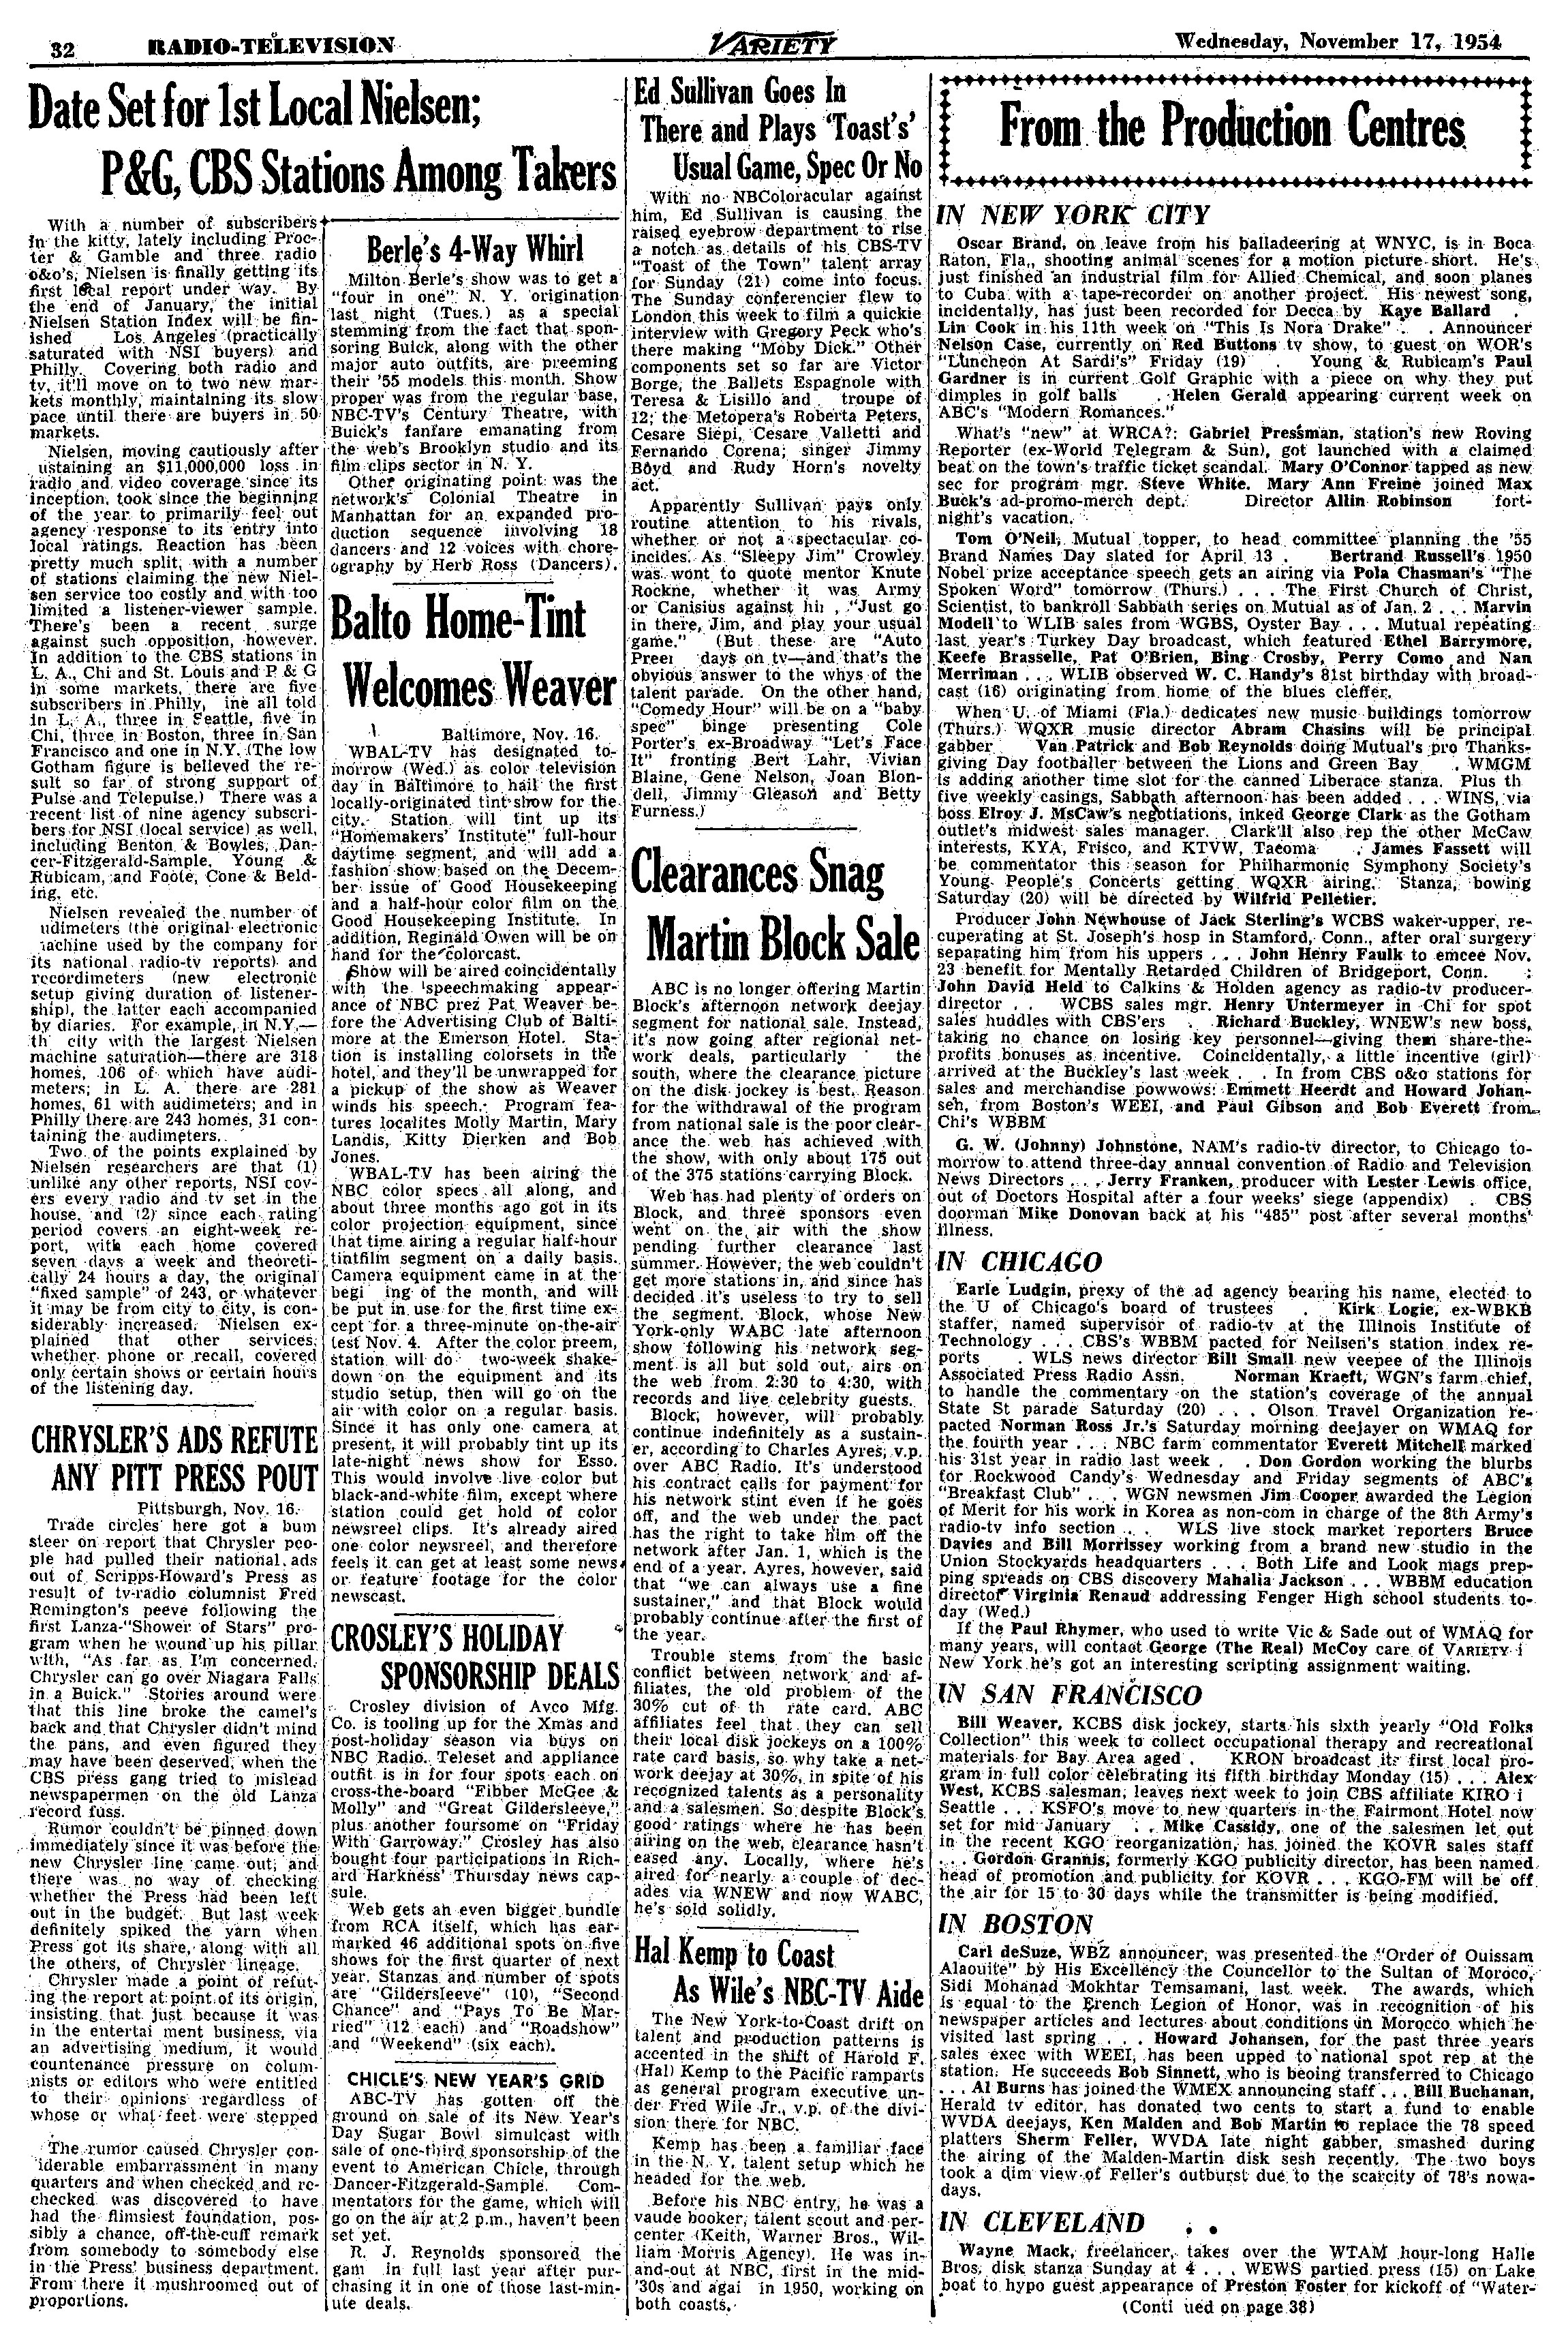 Variety196-1954-11_jp2.zip&file=variety196-1954-11_jp2%2fvariety196-1954-11_0167